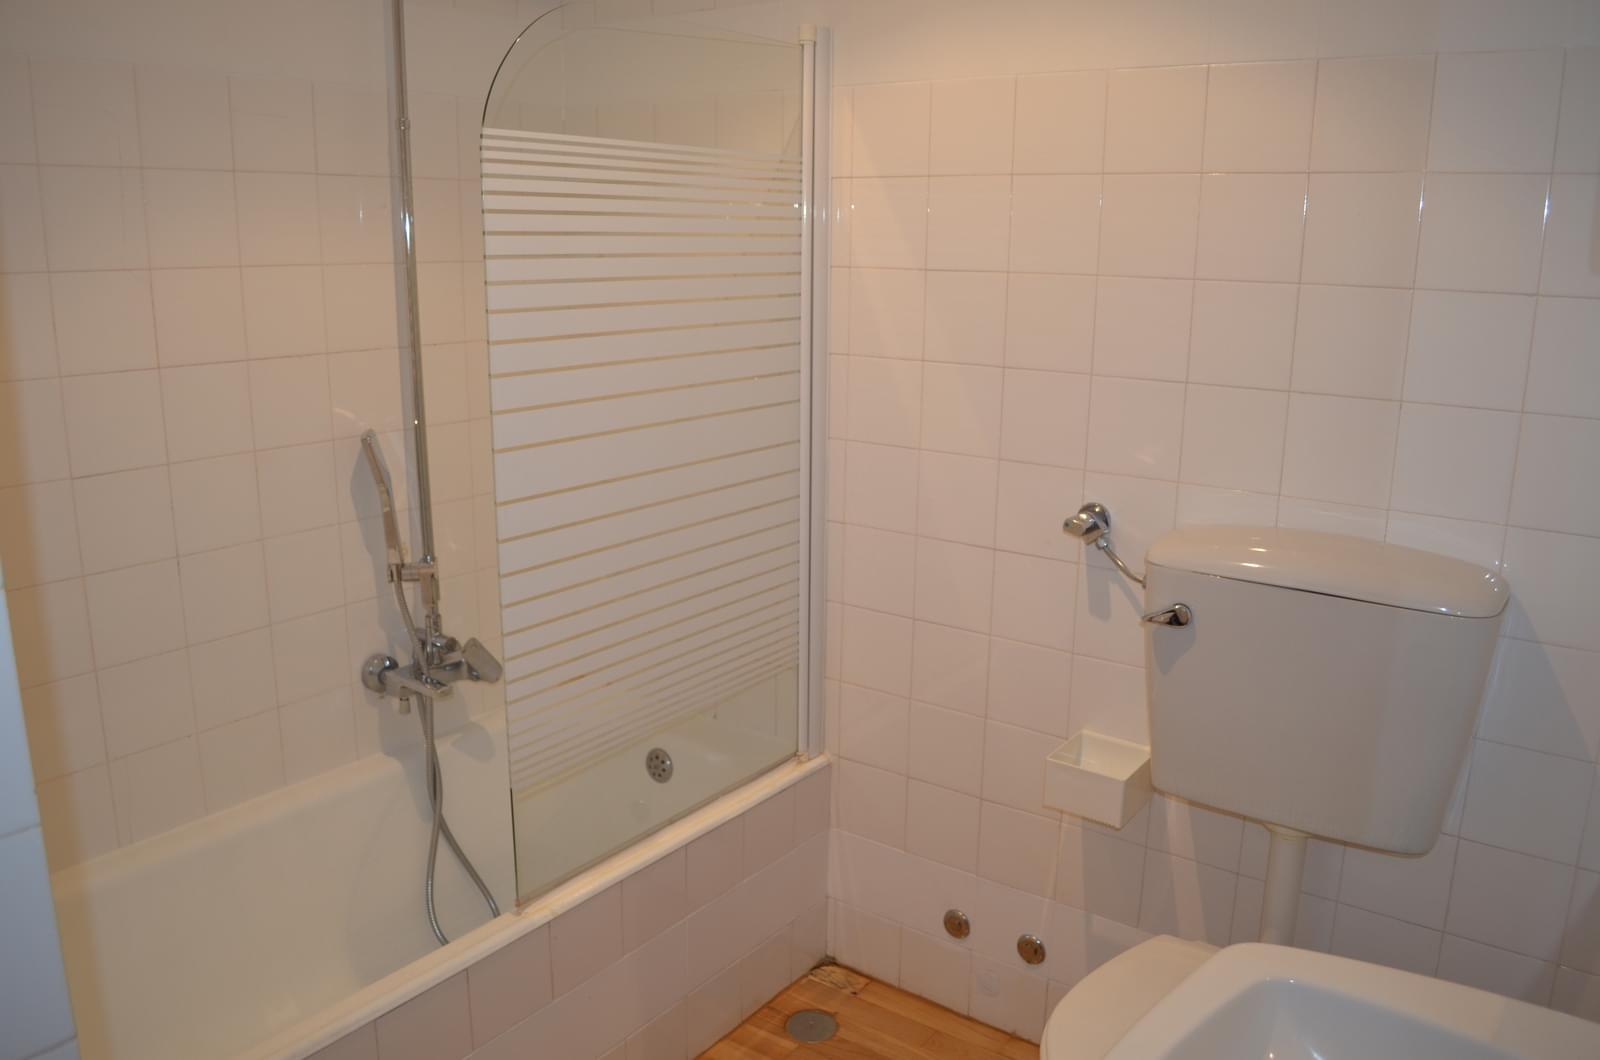 pf17565-apartamento-t3-lisboa-c18c35a9-8a3d-4b60-9b96-d5346a2c4123